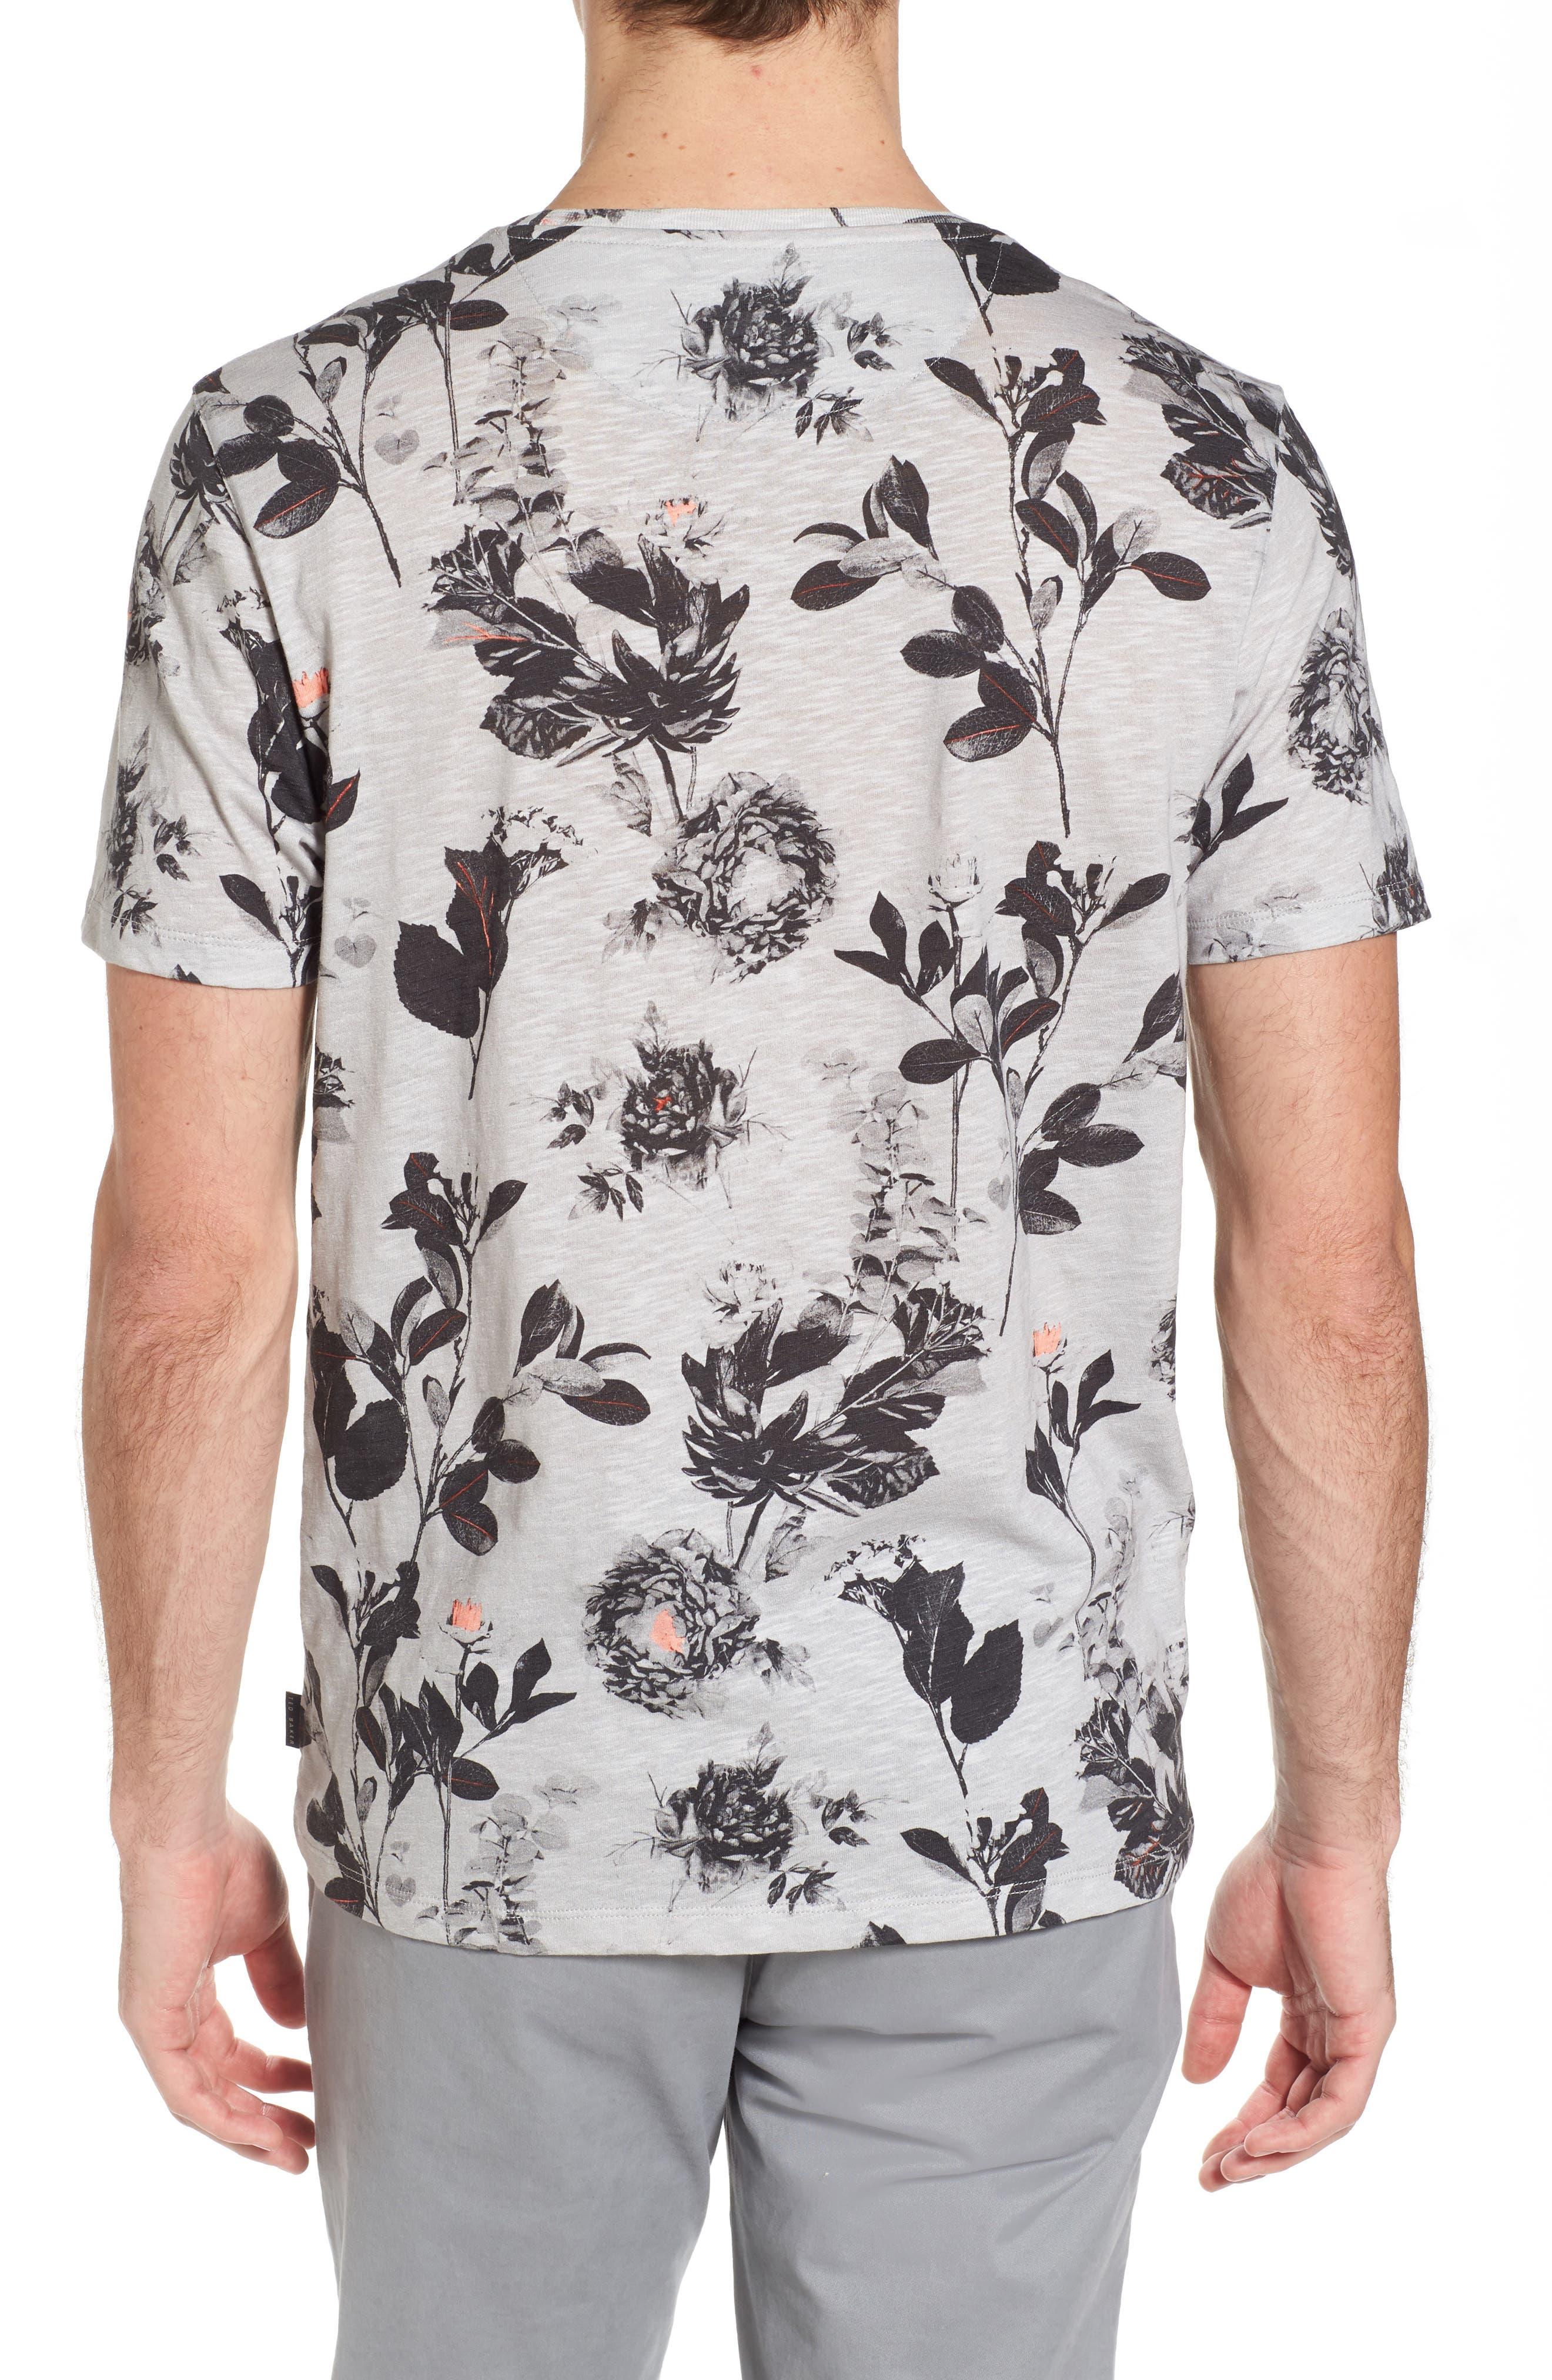 Doberma Trim Fit Floral Print T-Shirt,                             Alternate thumbnail 3, color,